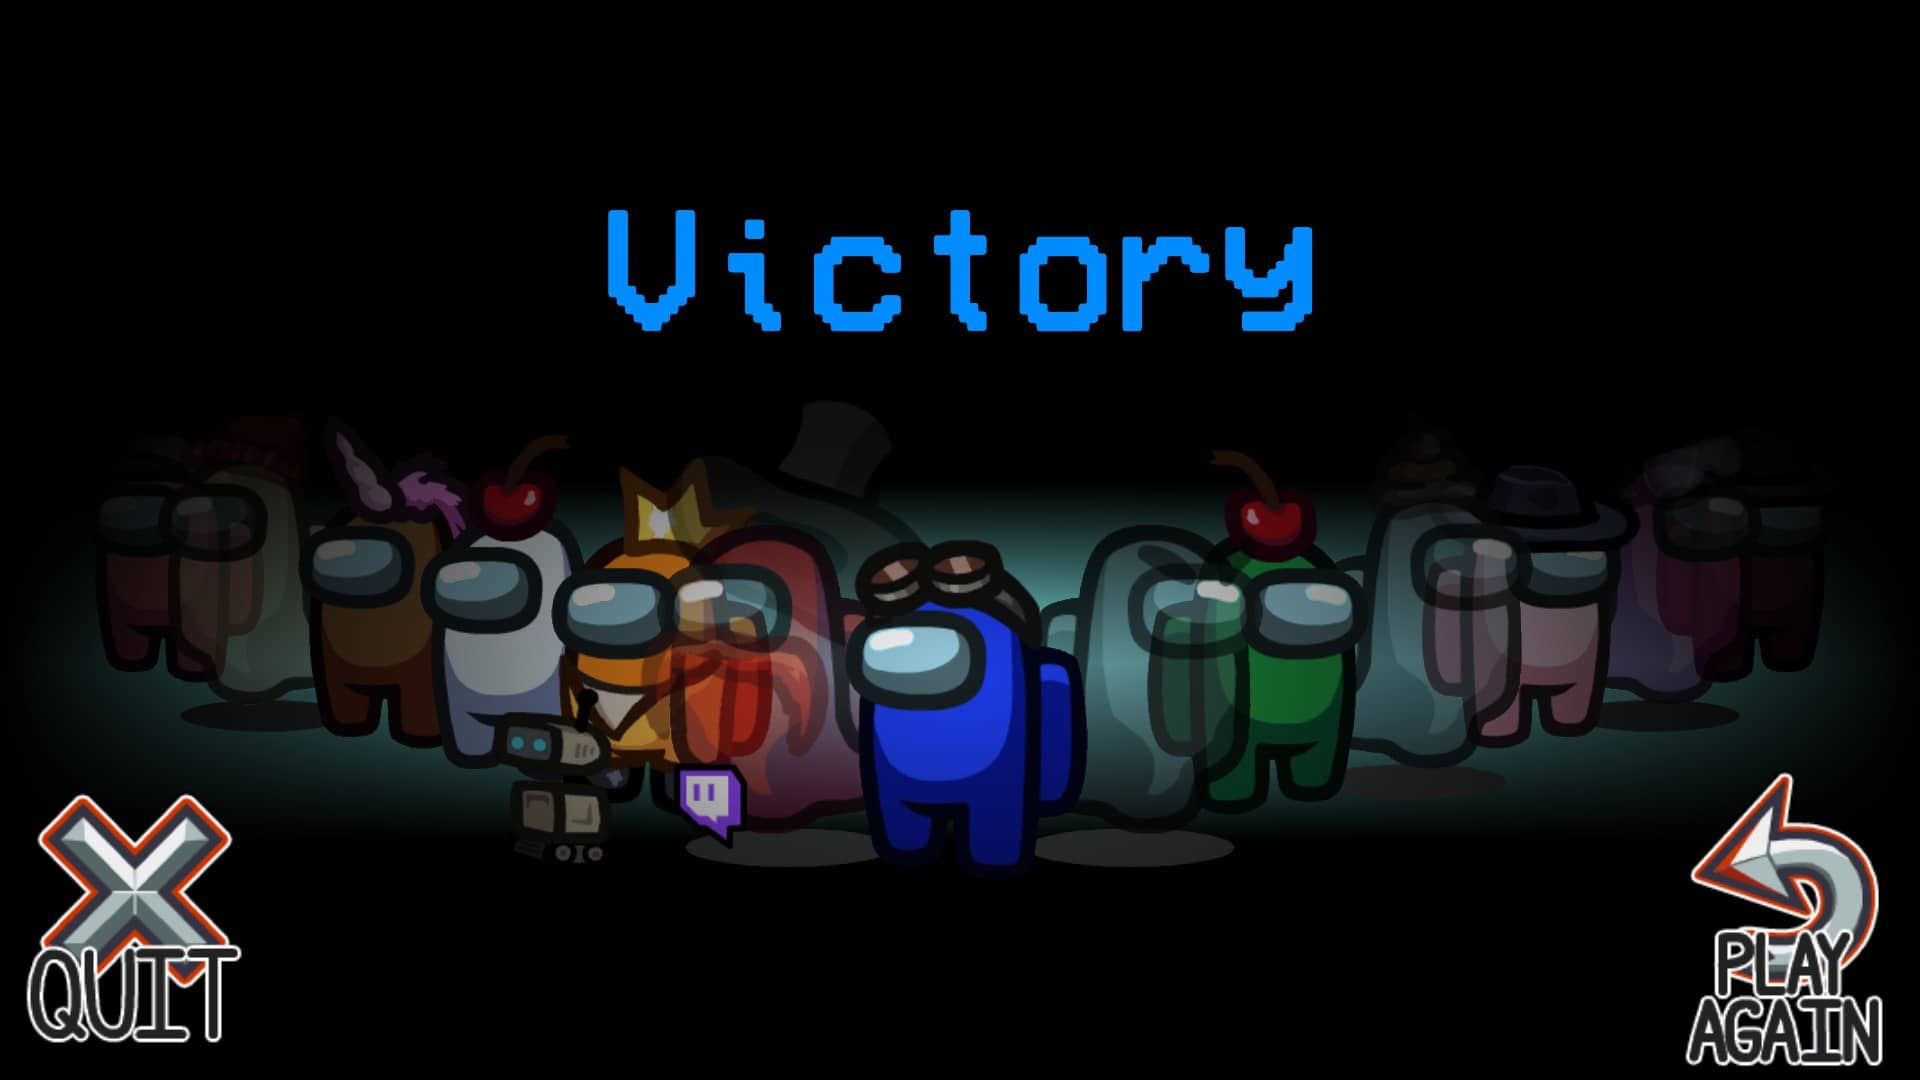 Among us victory